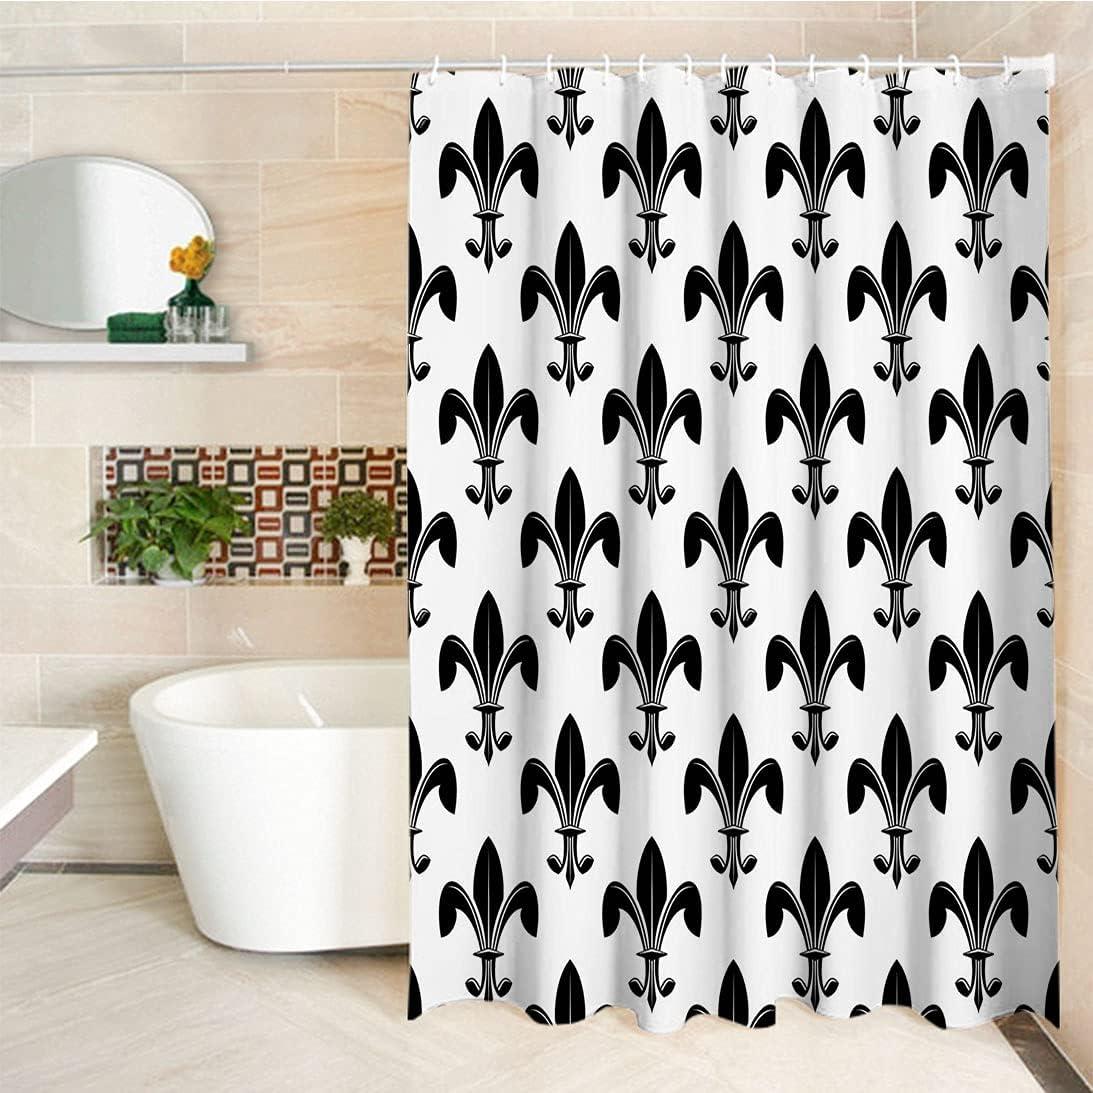 Vintage Custom Shower Curtain Black Classic and De Fleur Milwaukee Mall White 40% OFF Cheap Sale